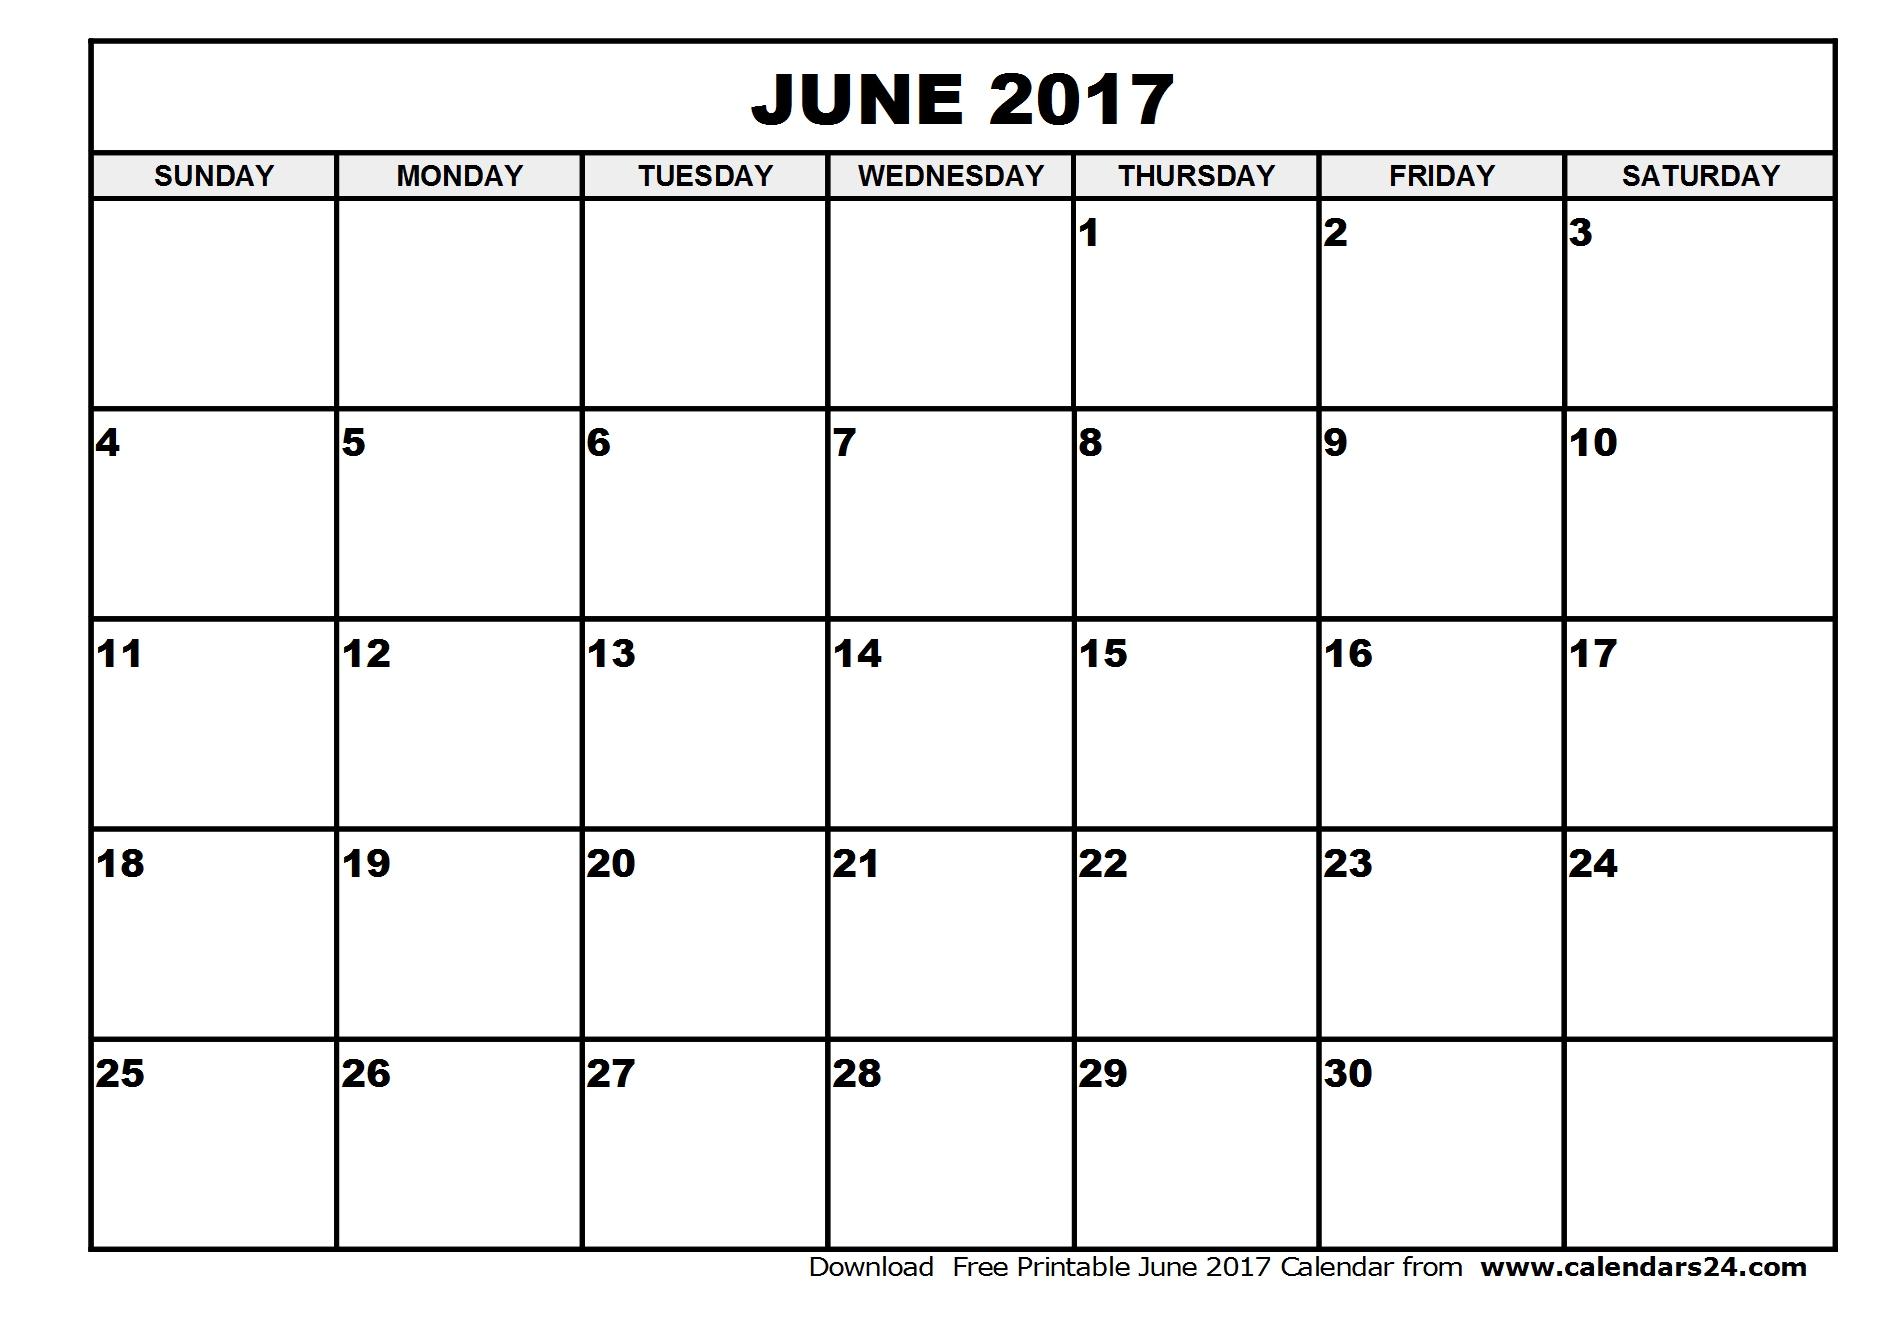 Calendar June And July 2017 - Bgadv for Blank Calendar June July